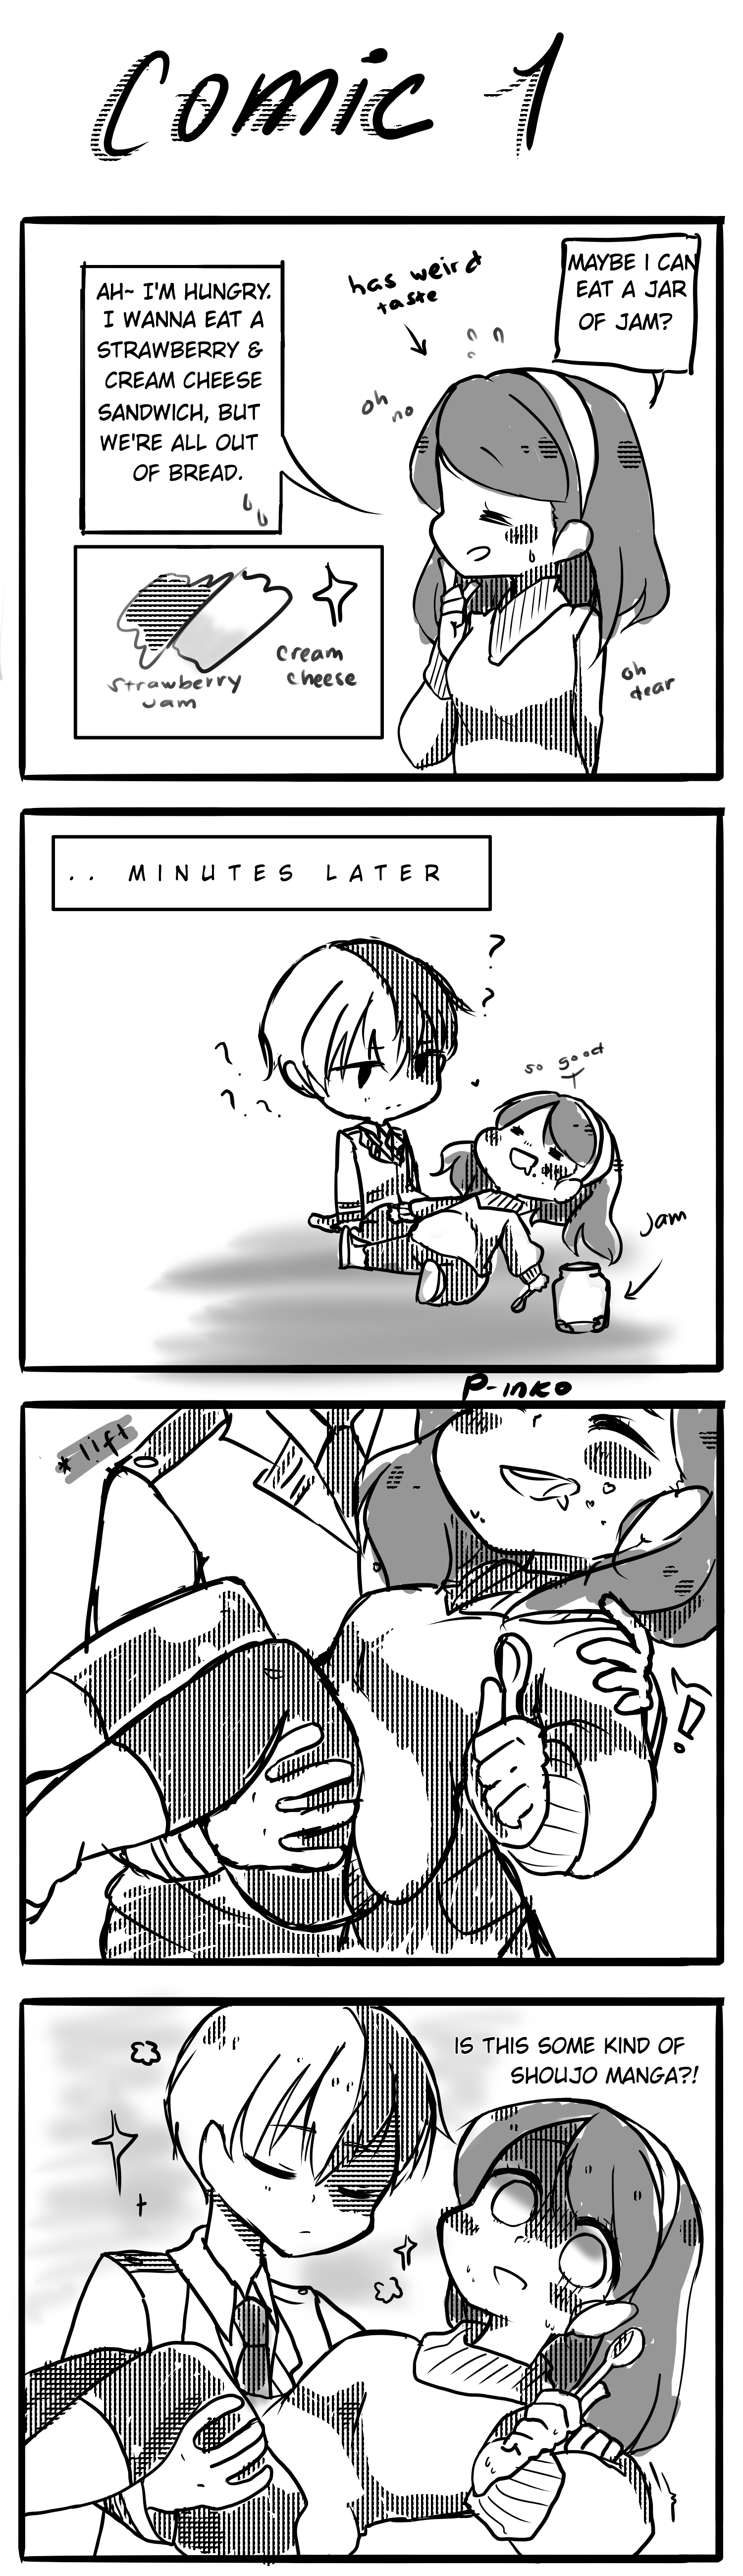 This isnt a shoujo manga by P-inko